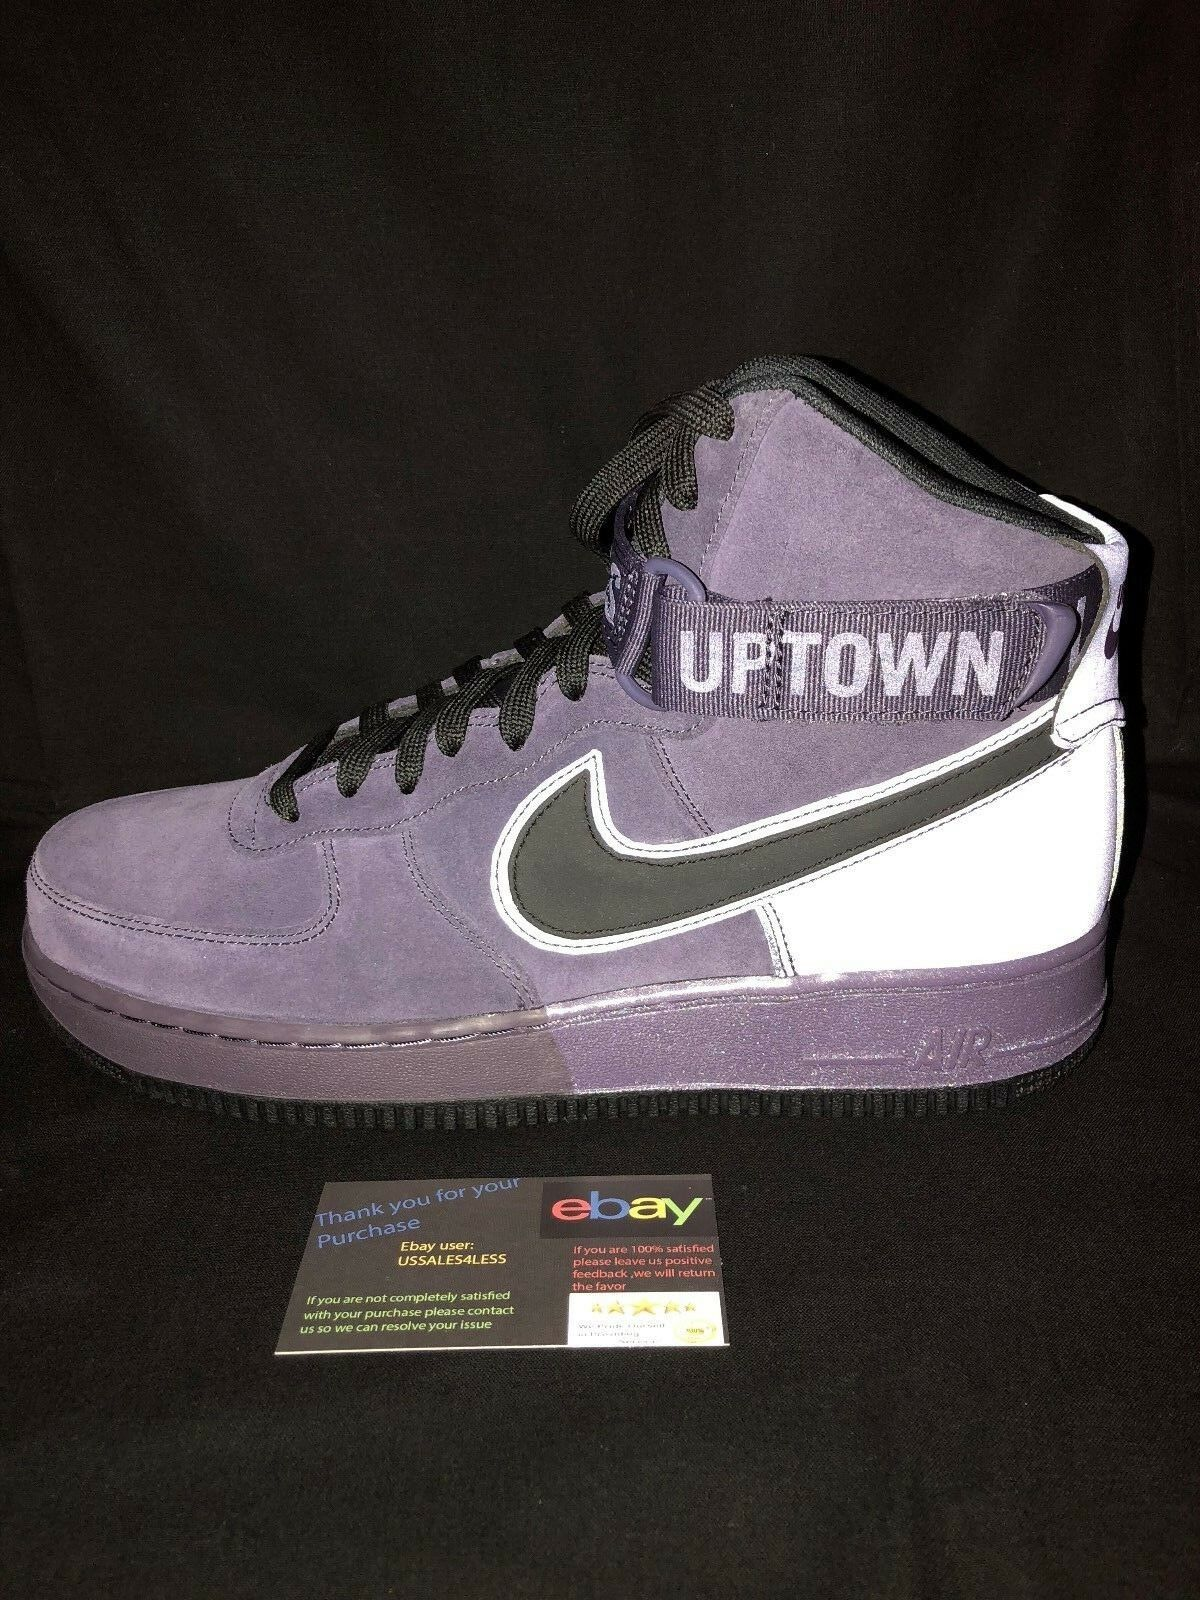 Nike Air Force 1 High '07 QS Men's shoes Dark Raisin Night Purple 573967-500